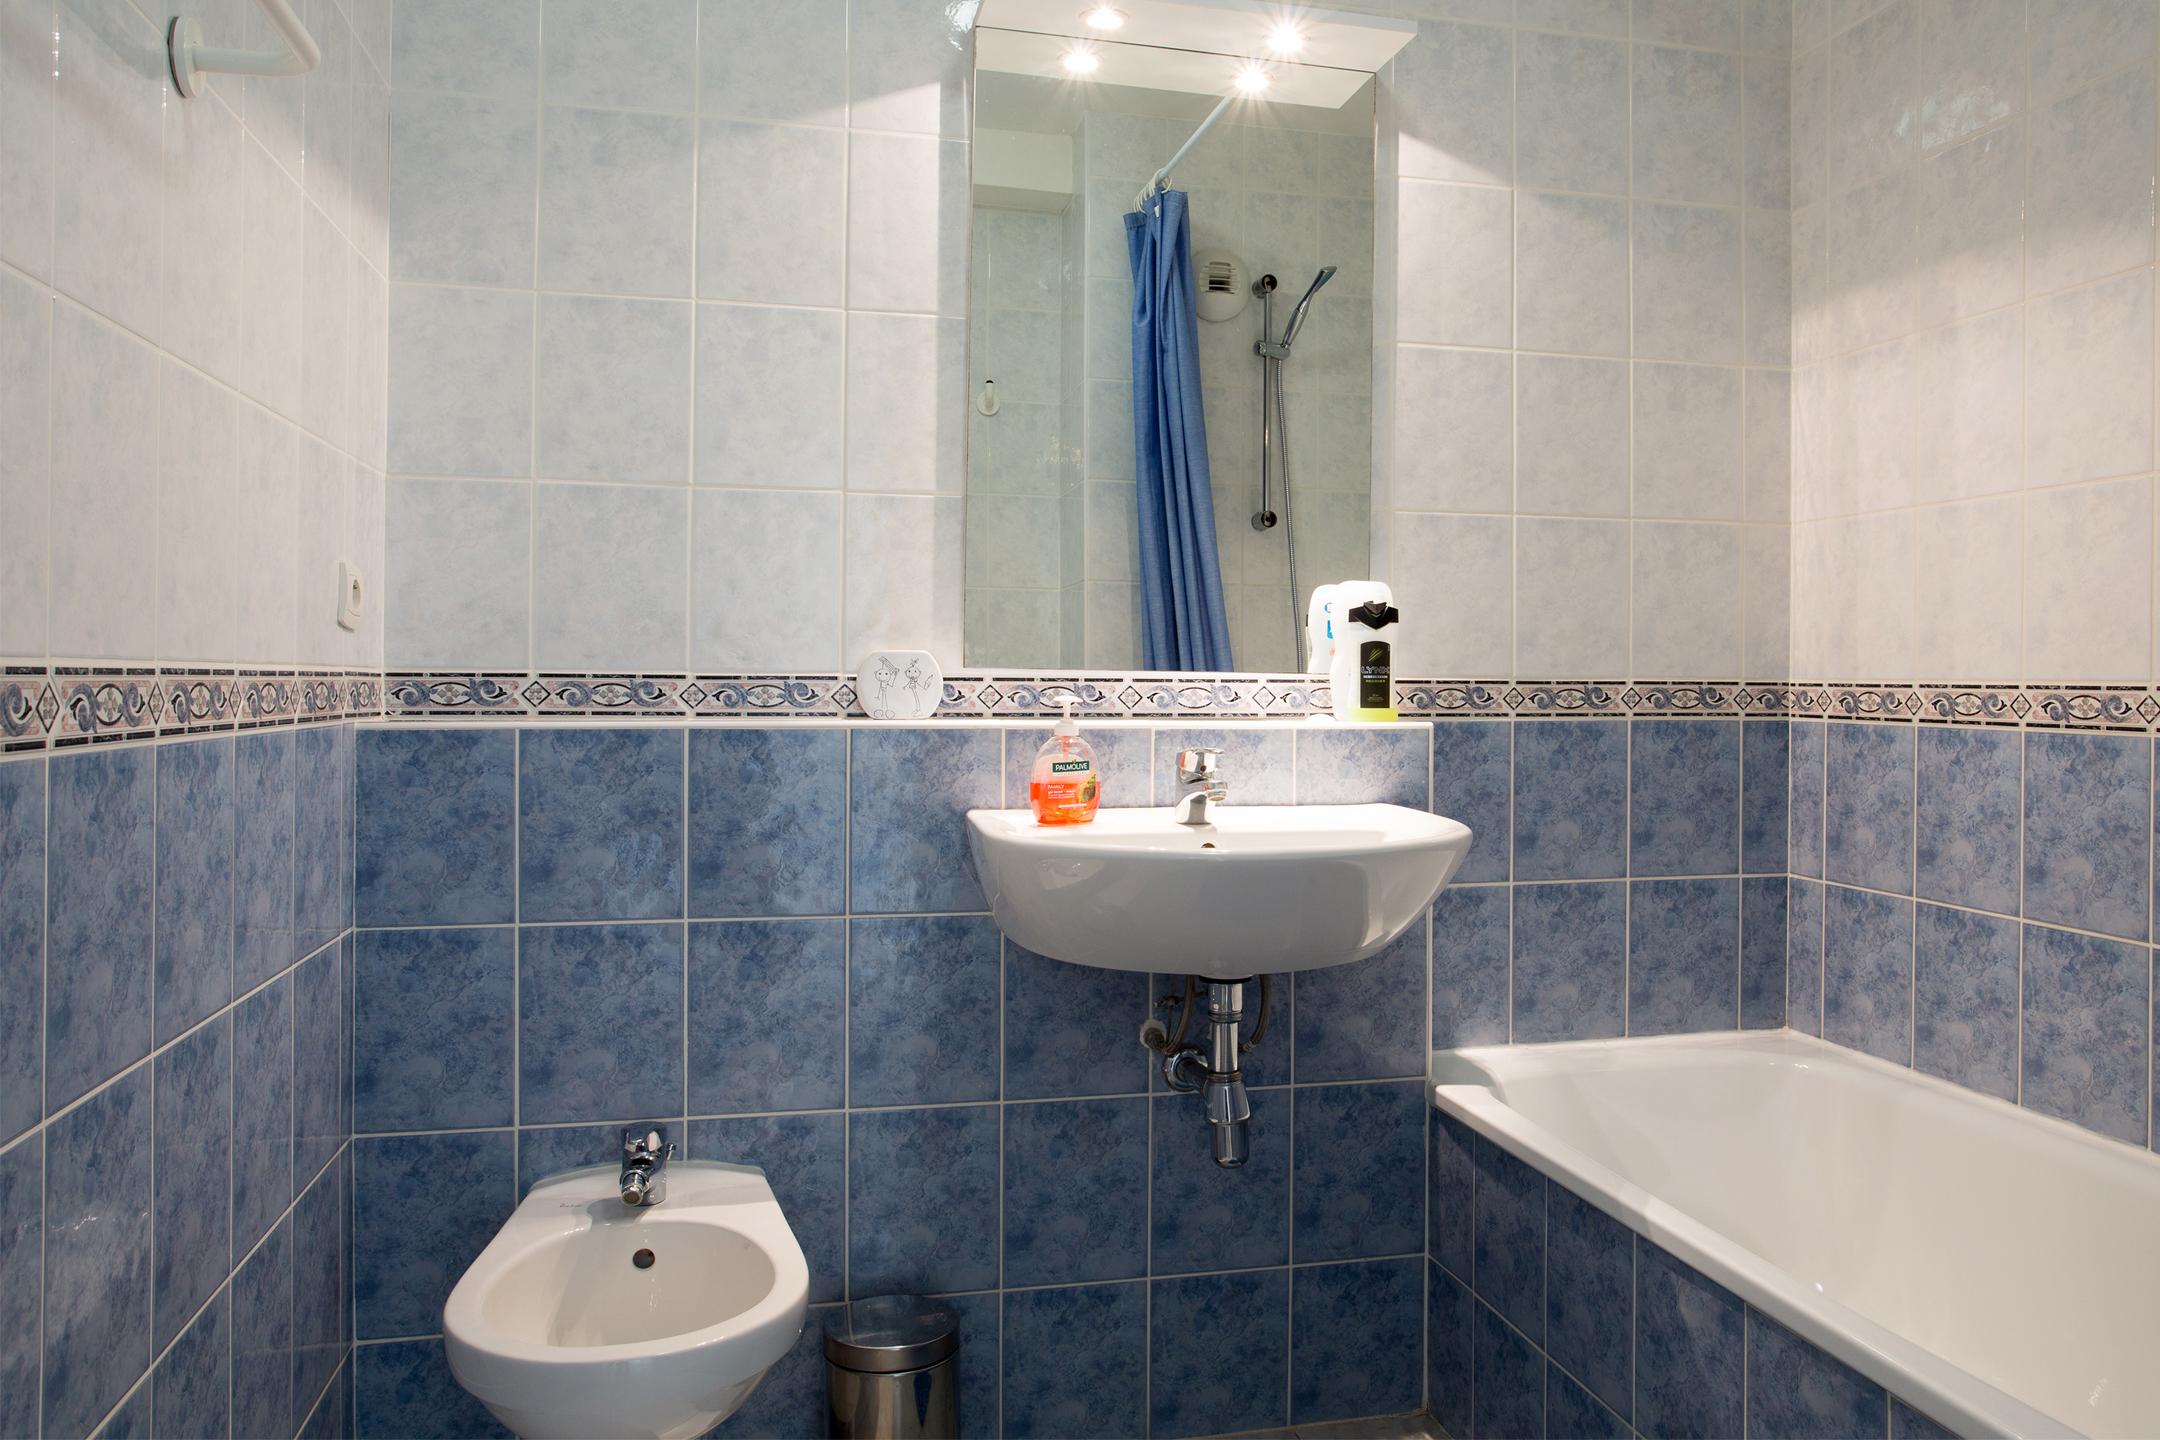 Beausoleil 2 bedroom apartment